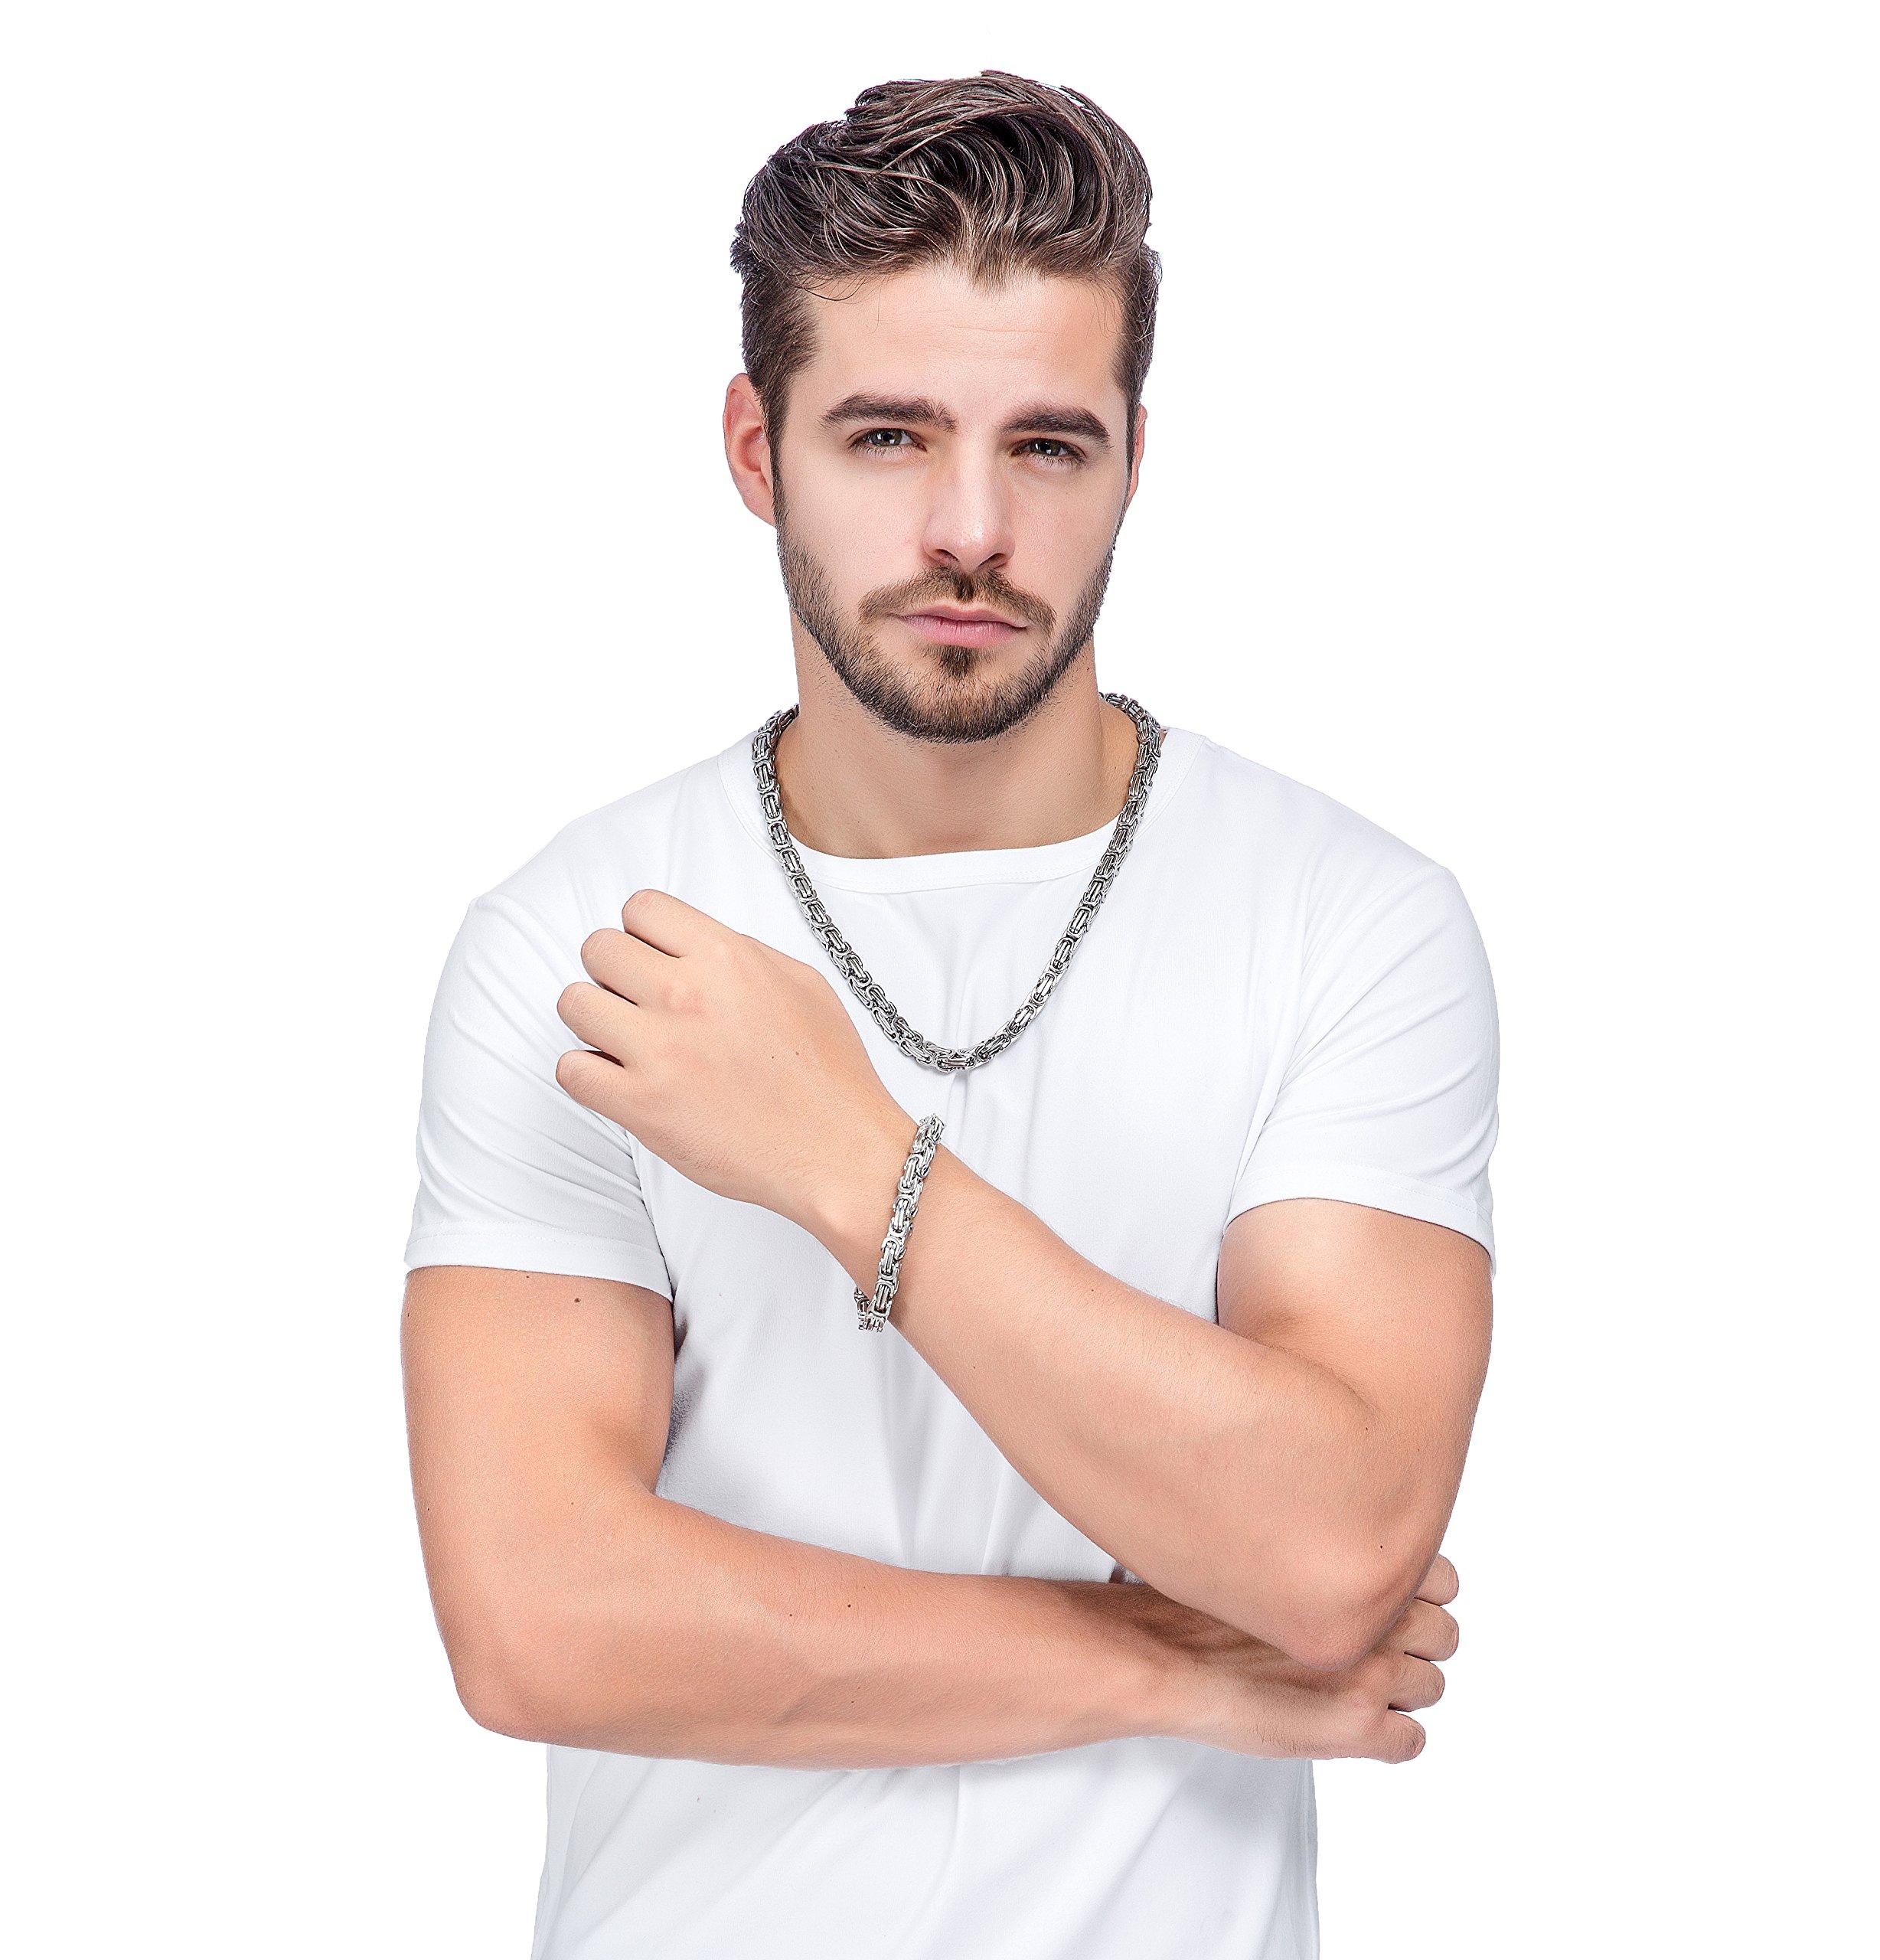 Jstyle Stainless Steel Male Chain Necklace Mens Bracelet Jewelry Set, 8mm Wide, 8.5 Inch Bracelet